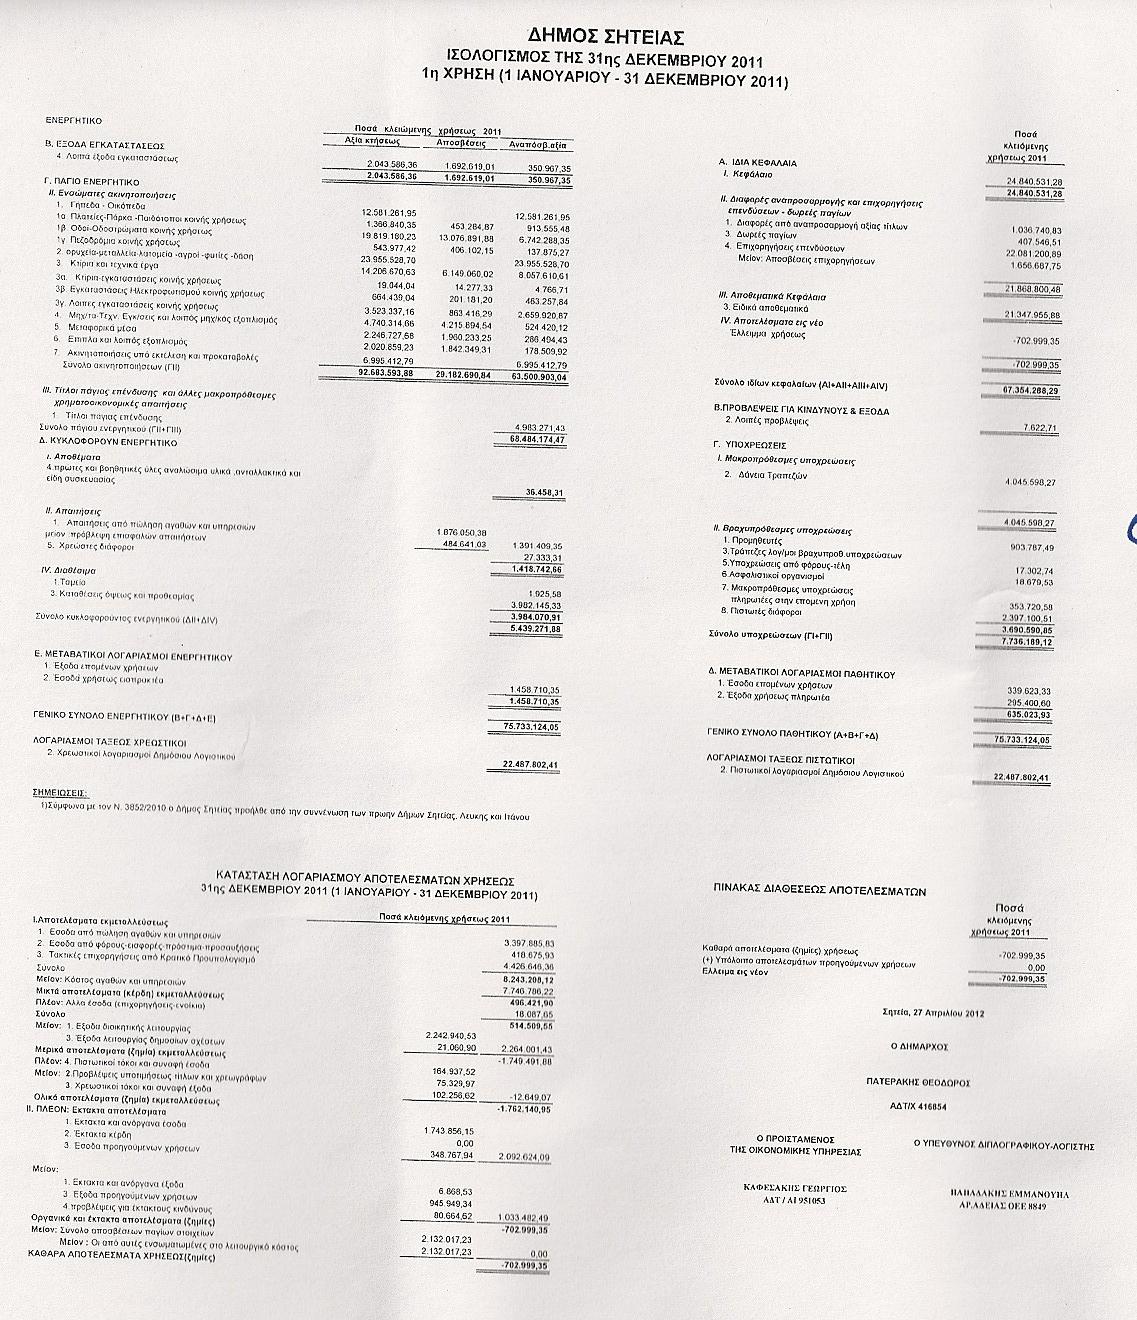 http://2.bp.blogspot.com/-0tJtpiR3u-c/UHJxtLi0zXI/AAAAAAAAB2M/c4S0tXU3SHE/s1600/%CF%83%CE%AC%CF%81%CF%89%CF%83%CE%B70003.jpg